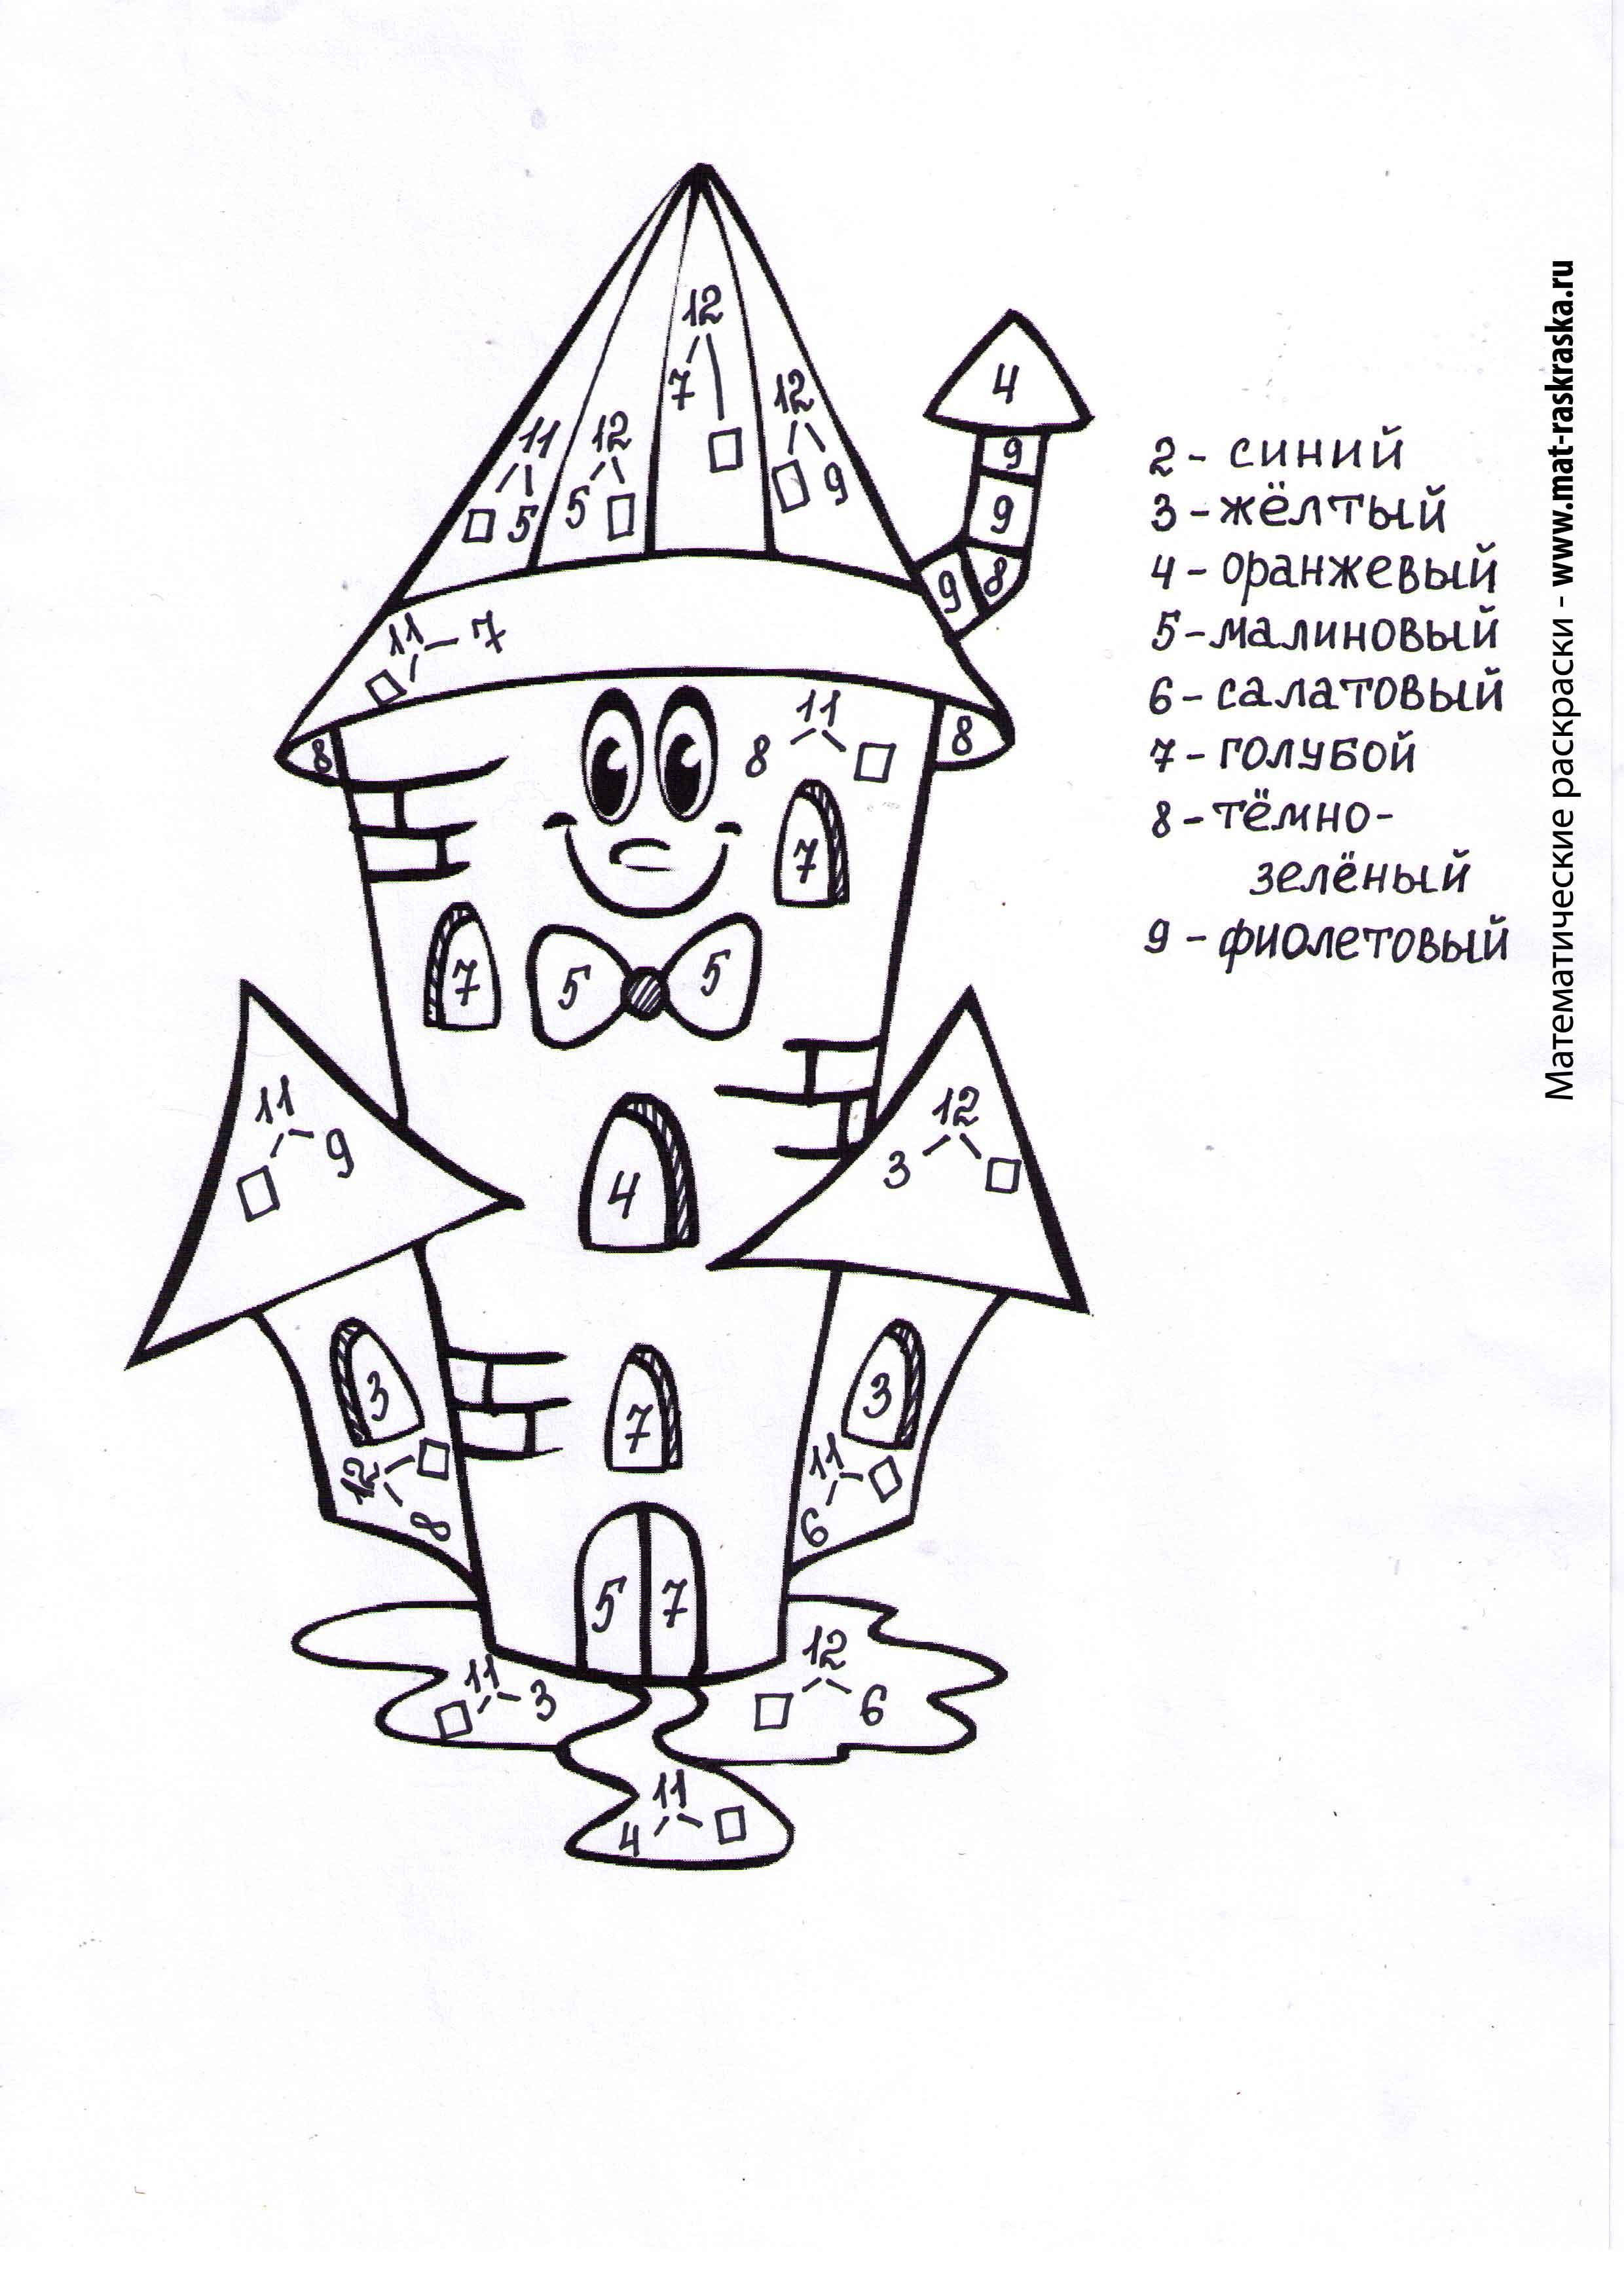 http://www.mat-raskraska.ru/images/stories/Raskraski/Sloz-vich-v-pred-20/domik-sostav-chisel11-12_big.jpg